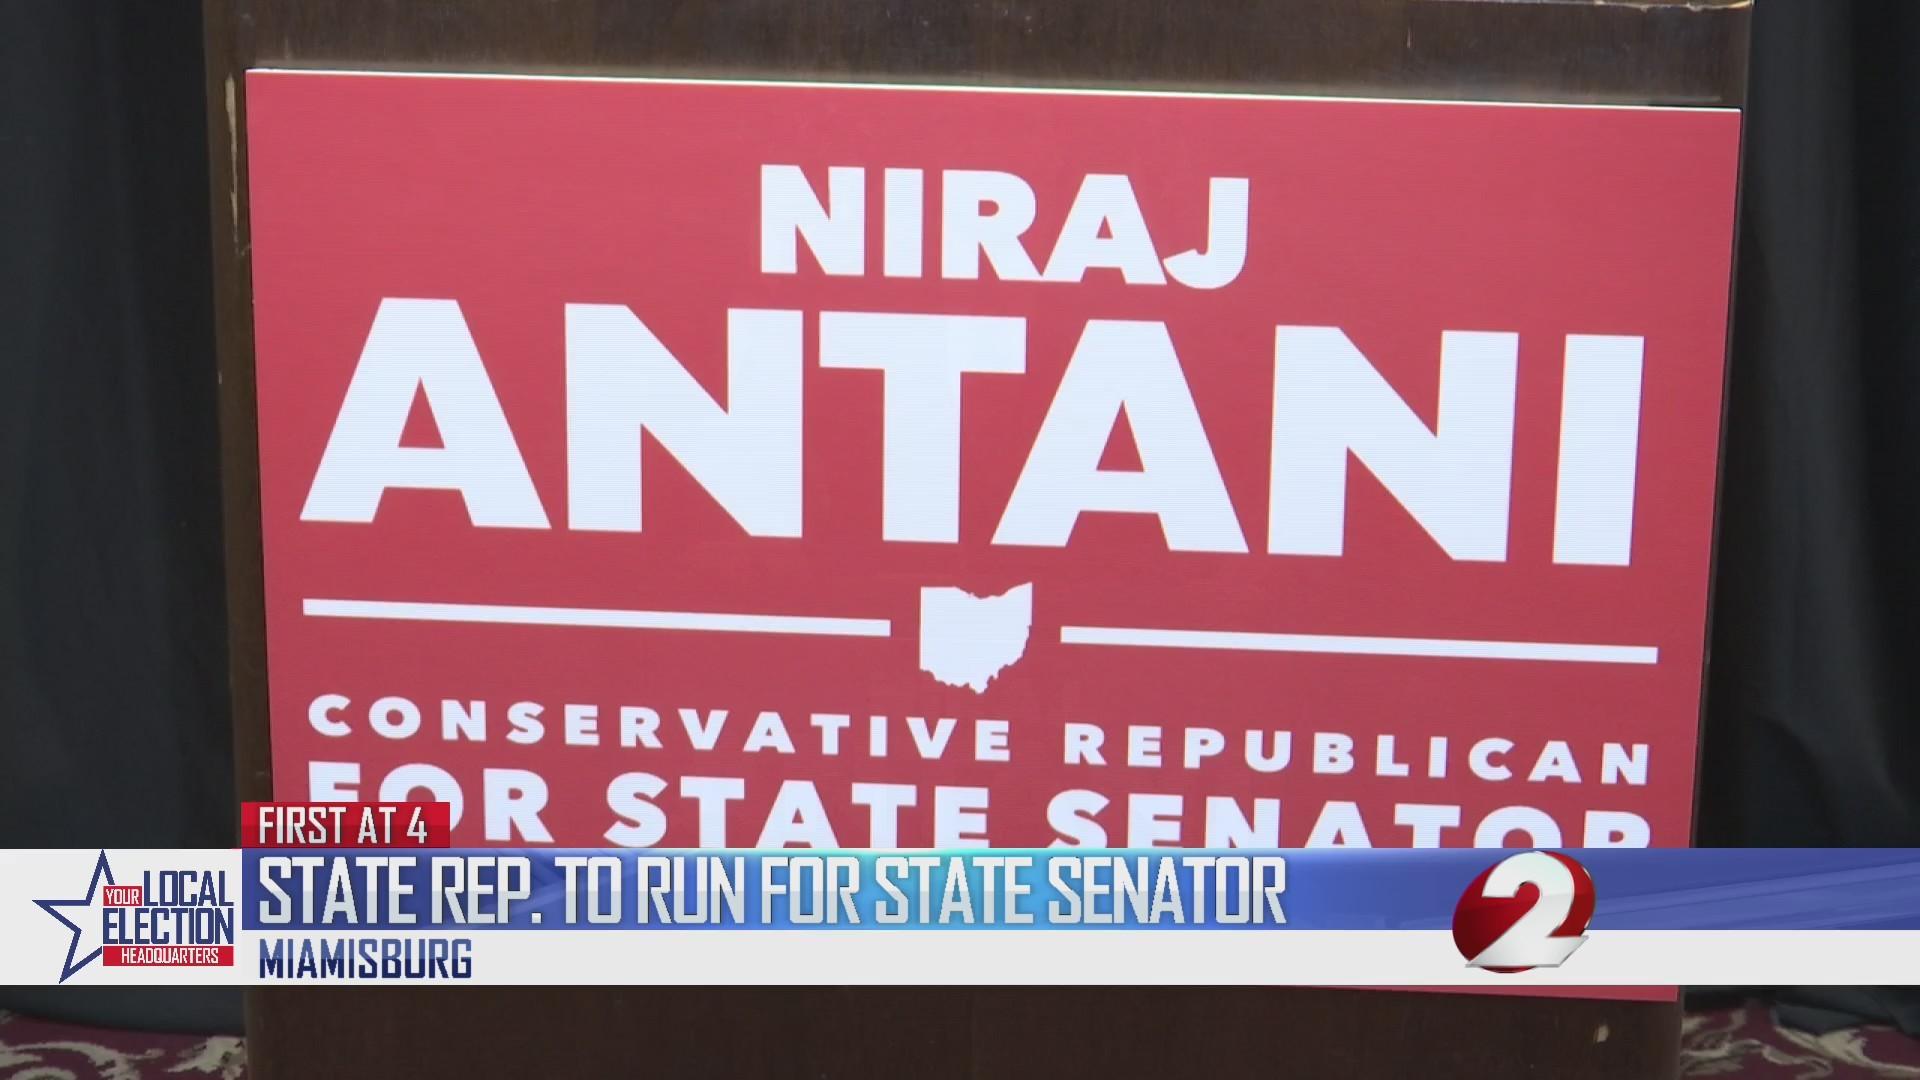 State Rep. to run for State Senator